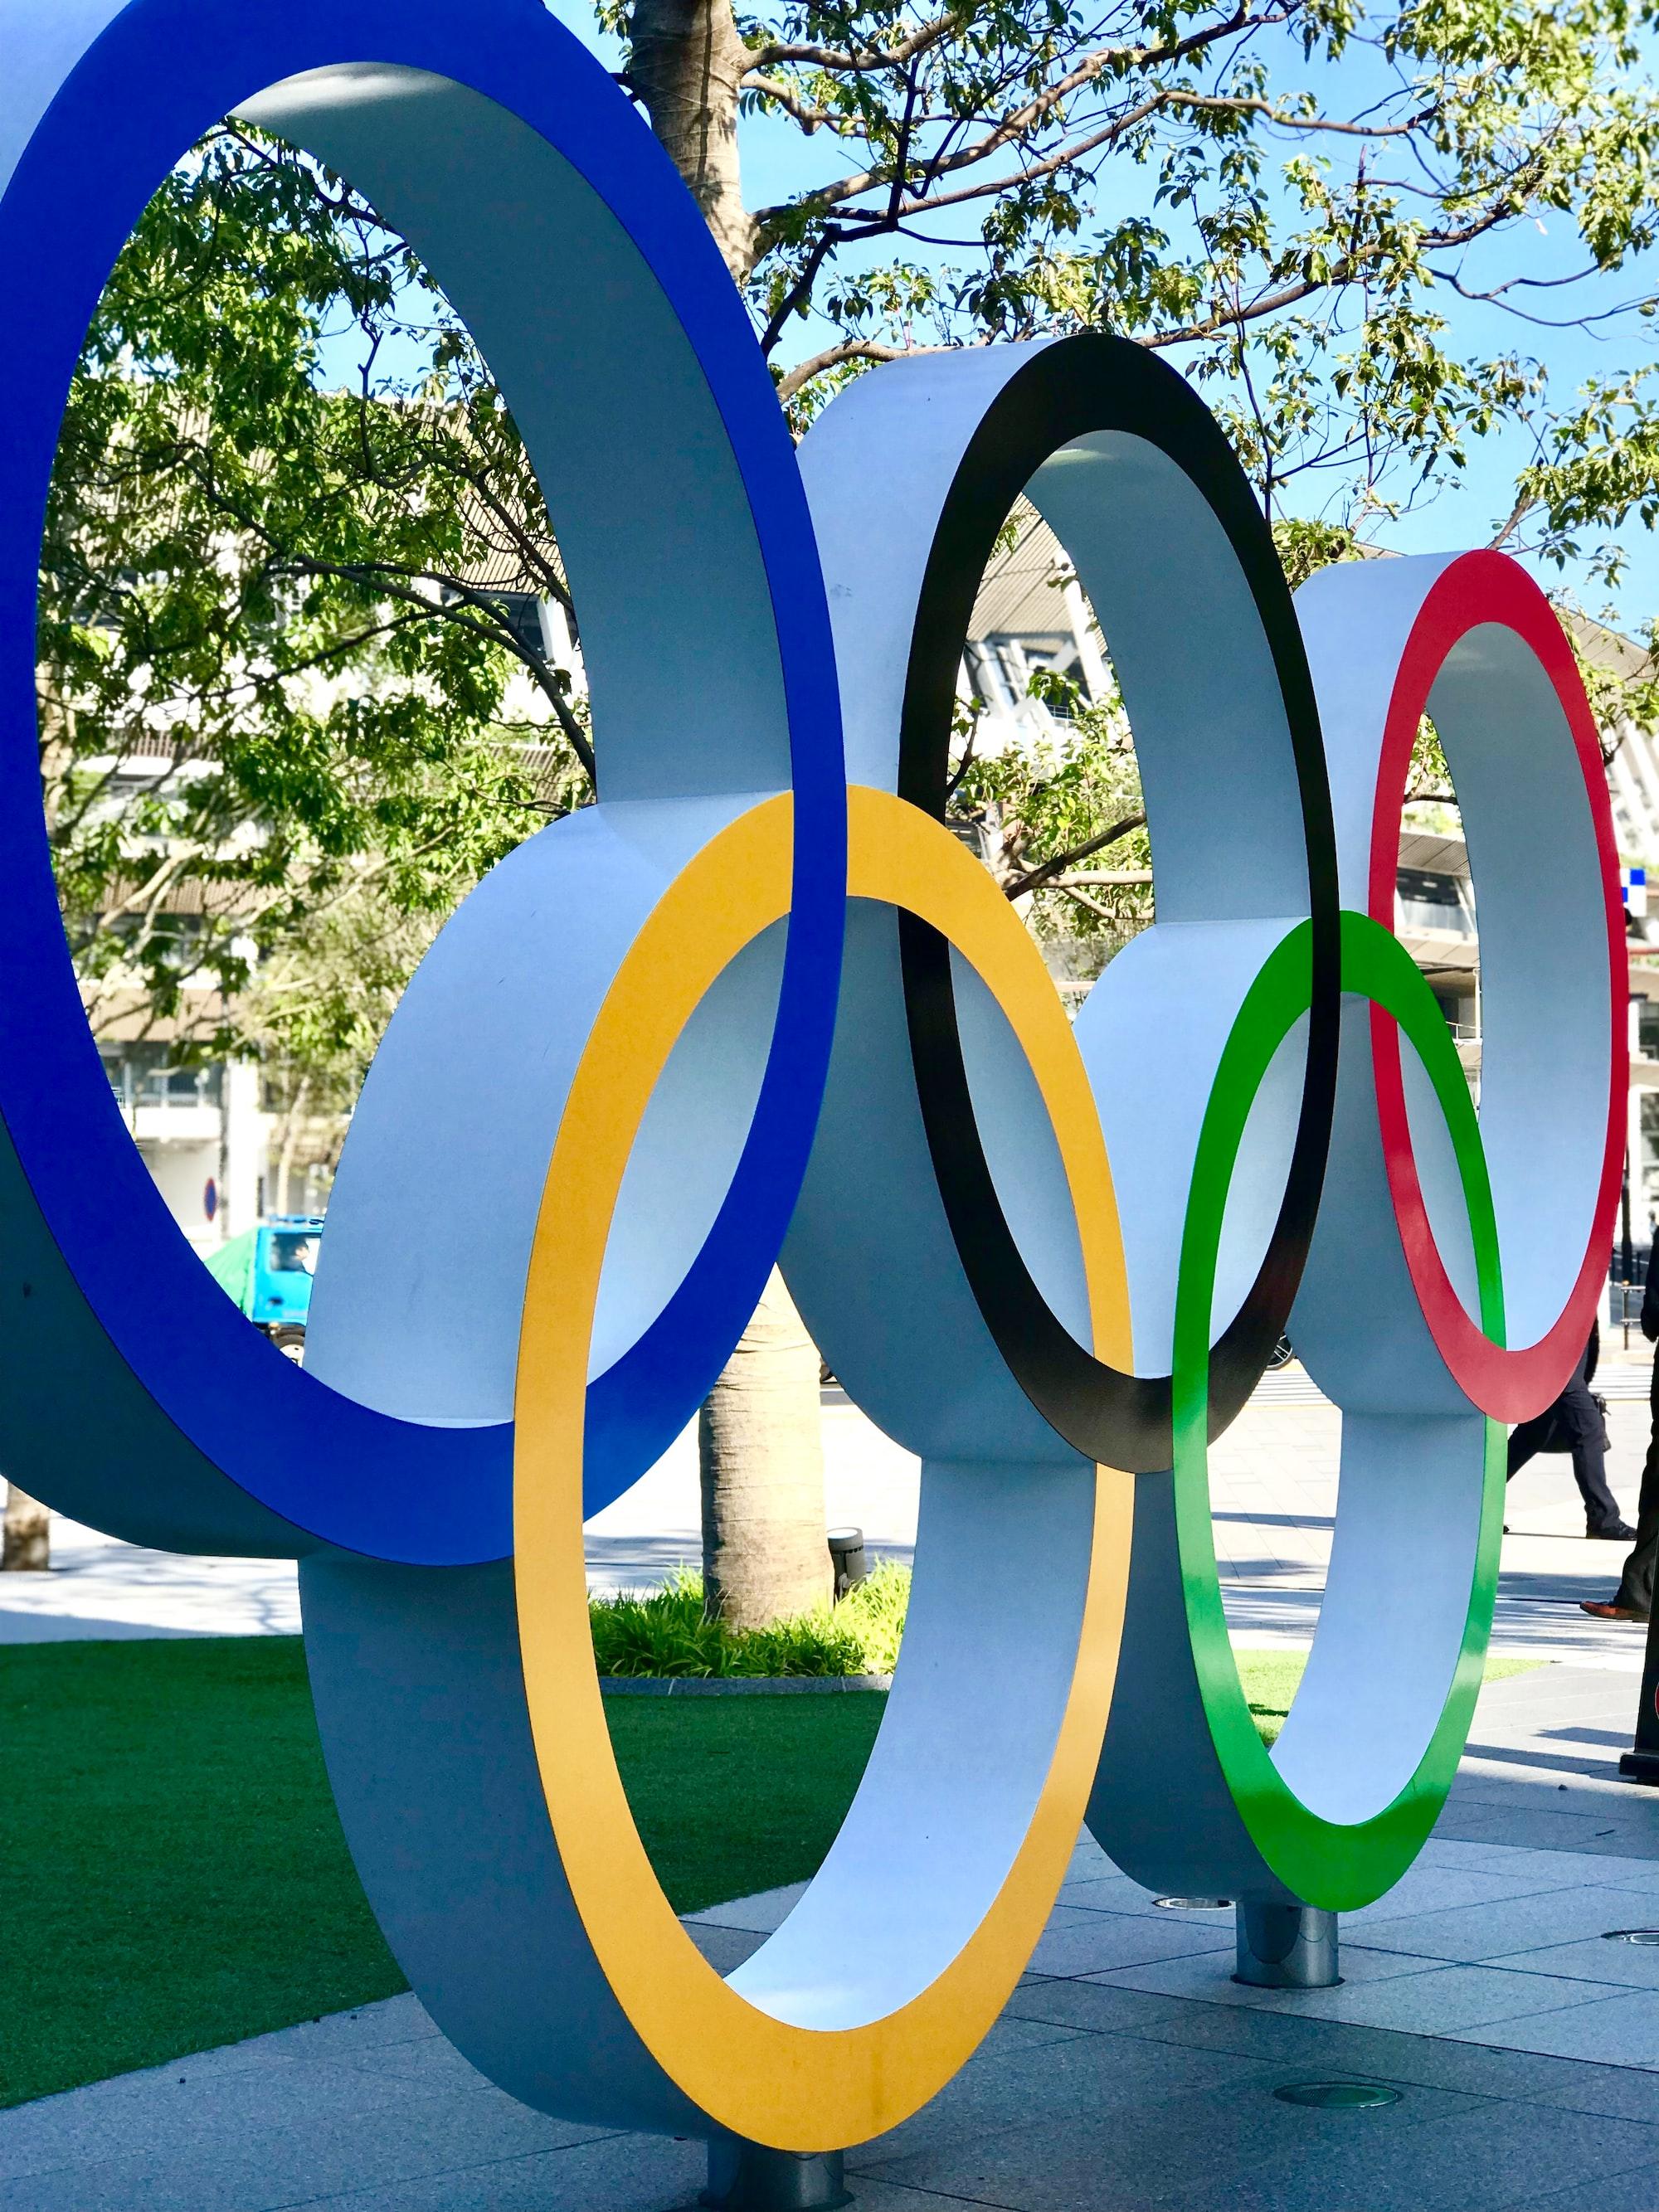 Stream the Tokyo 2020 Olympics Games on BBC iPlayer